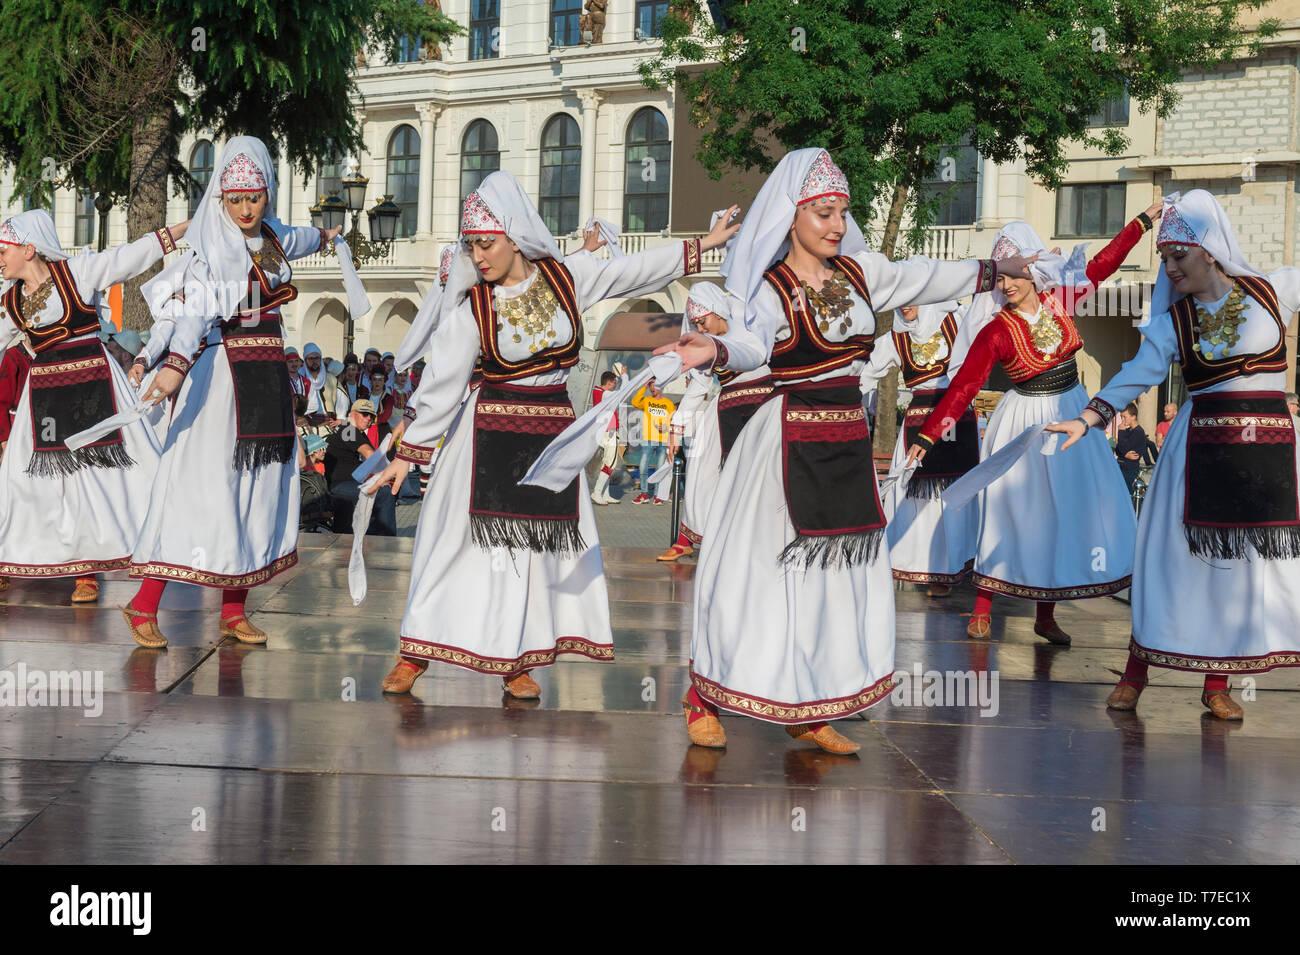 International Folklore Festival, Youth Day, Skopje, Macedonia - Stock Image